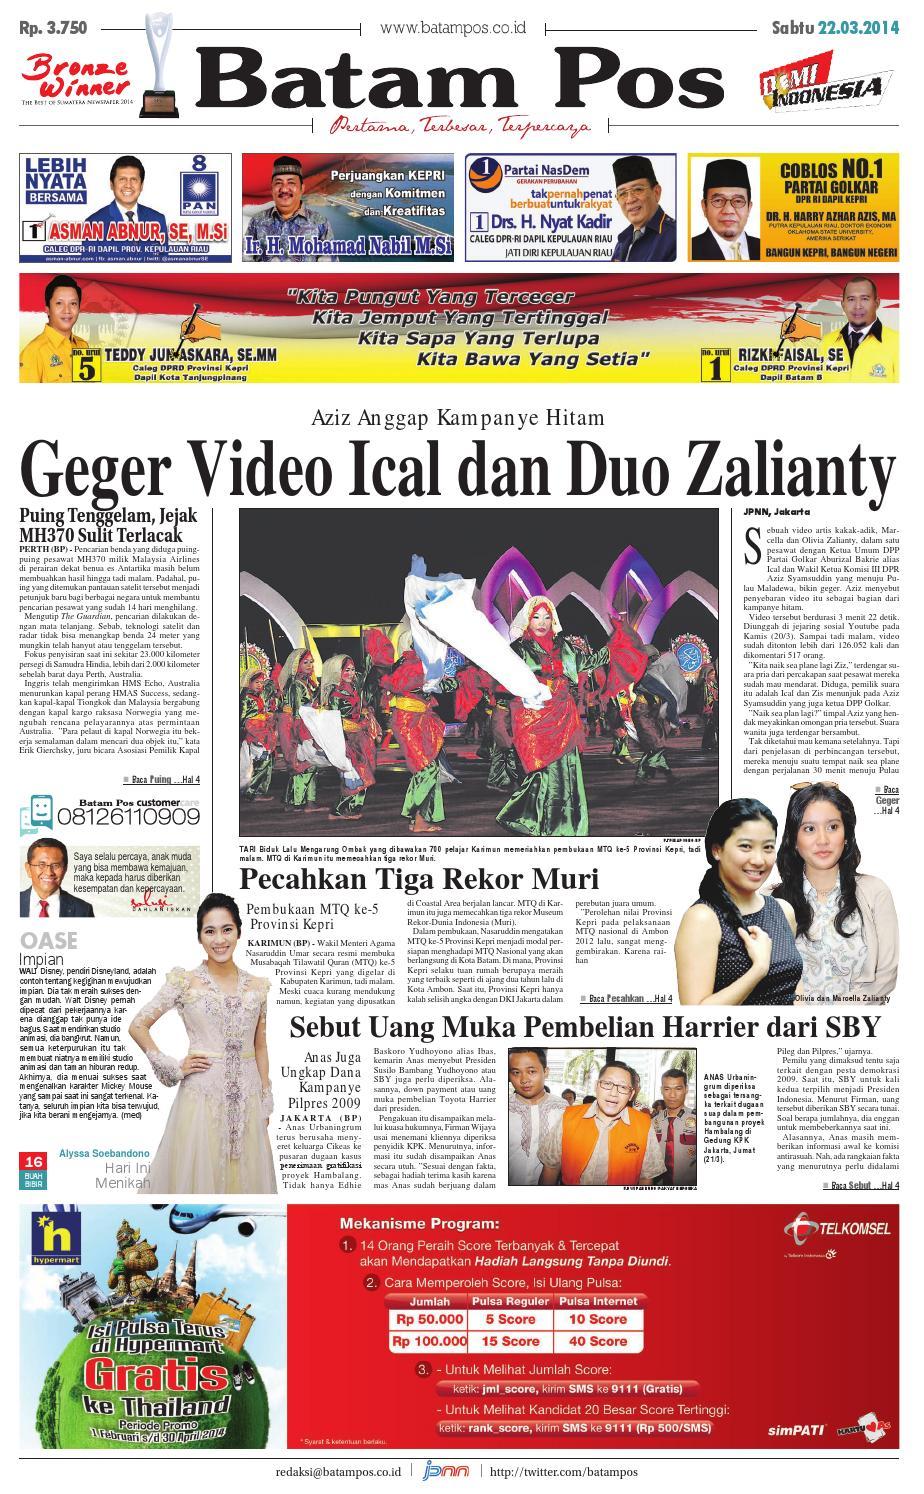 22 Maret 2014 By Batampos Newspaper Issuu Produk Umkm Bumn Bolu Gulung Hj Enong